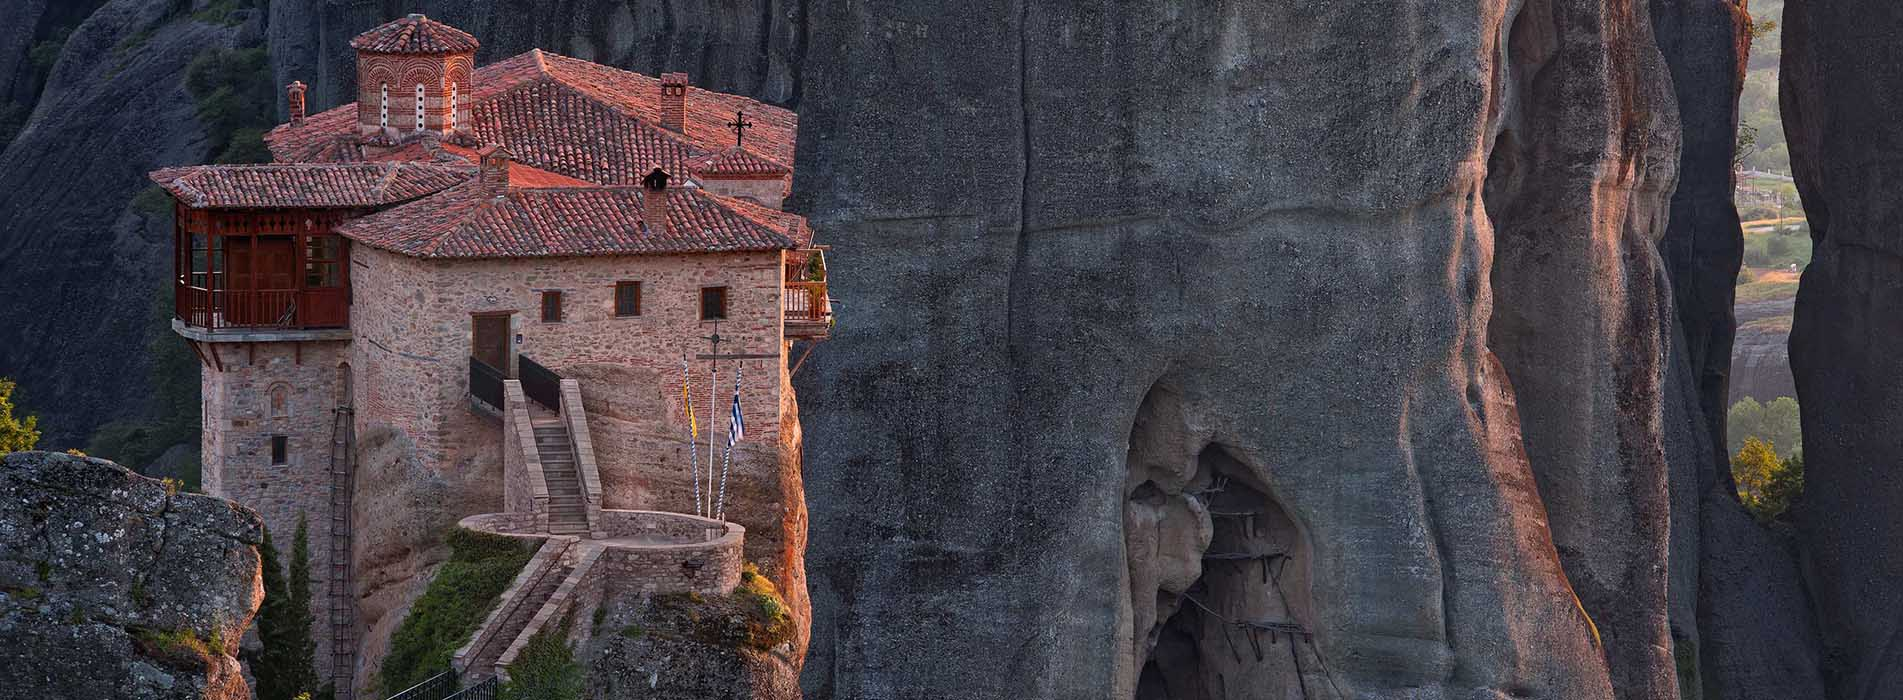 Greece - Meteora 6 (main)